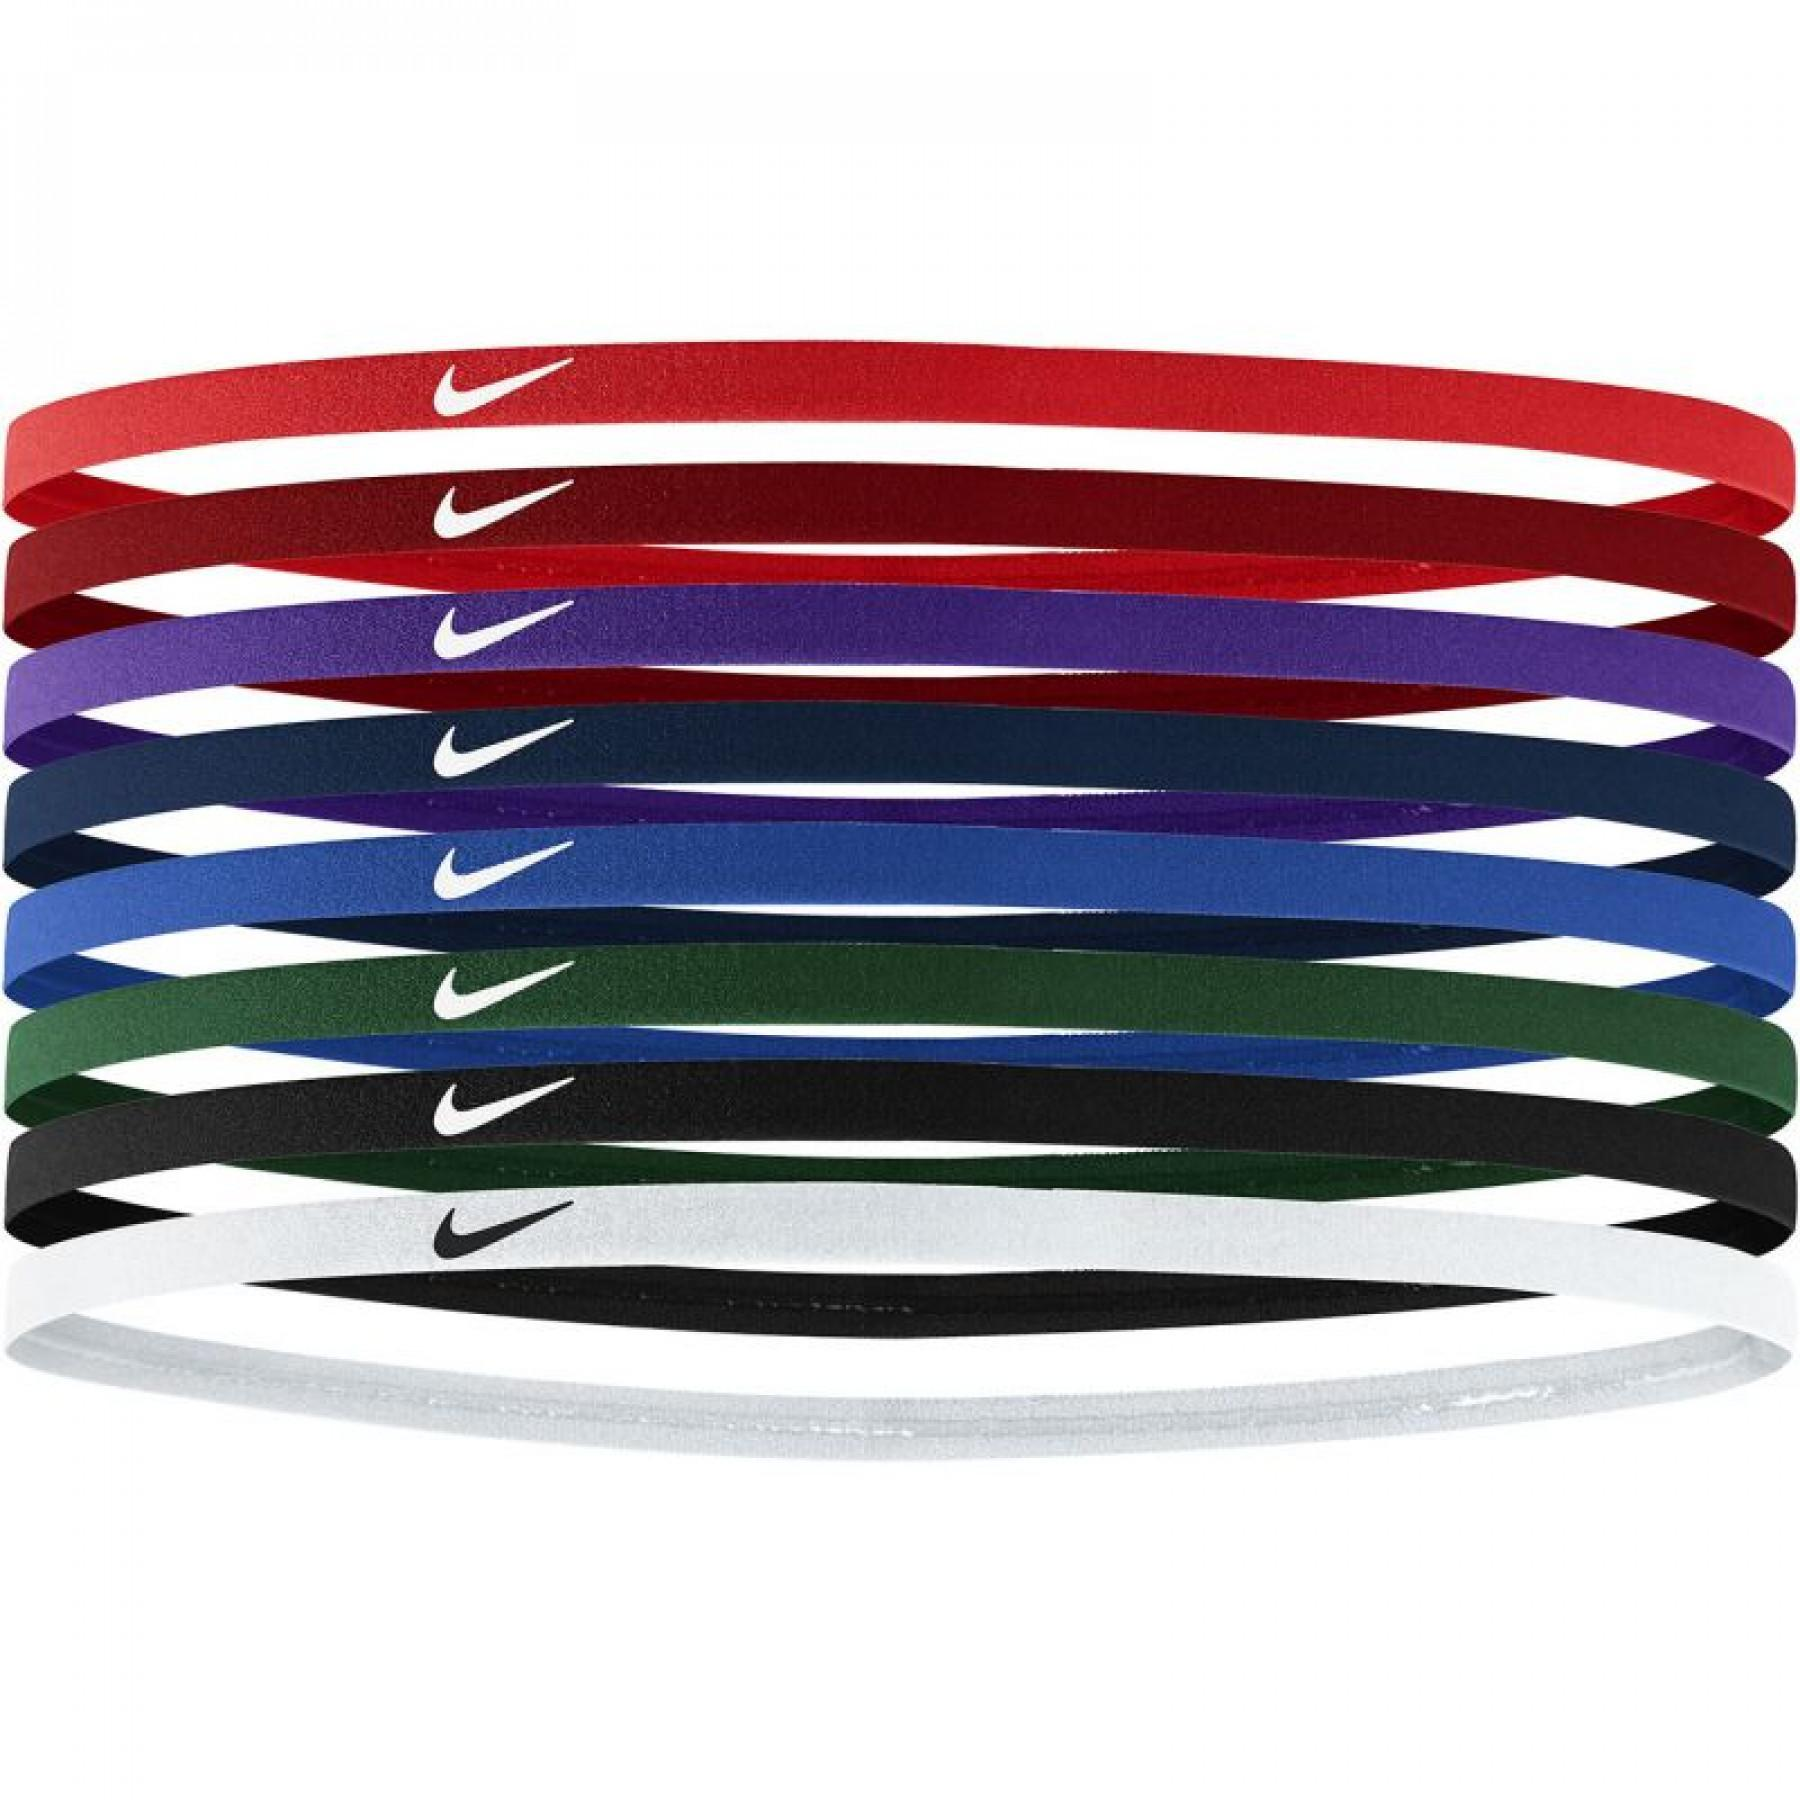 Pack of 8 Nike skinny hair bands